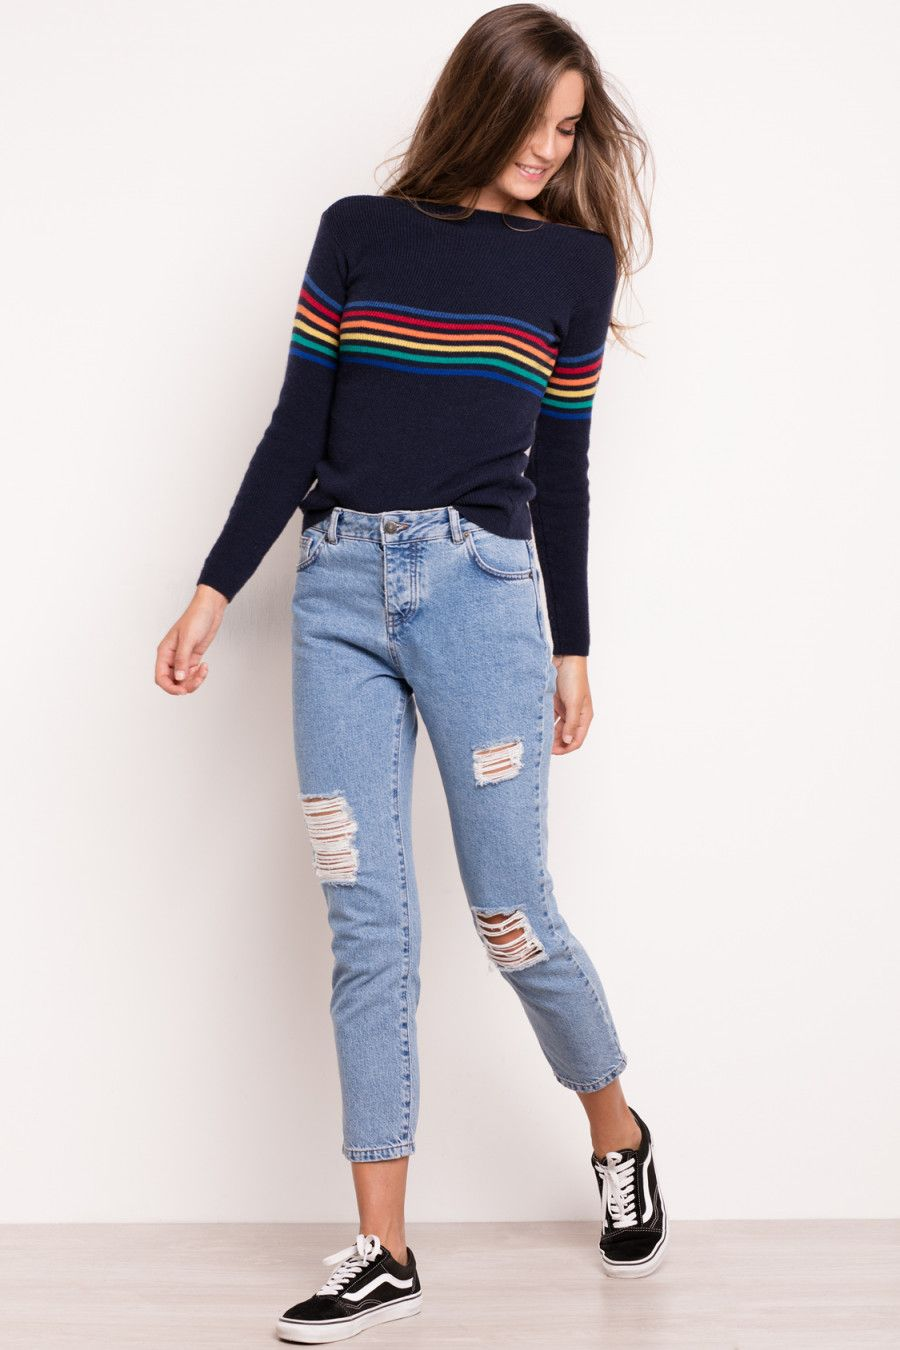 9b53cca35f7c Rainbow Sweater